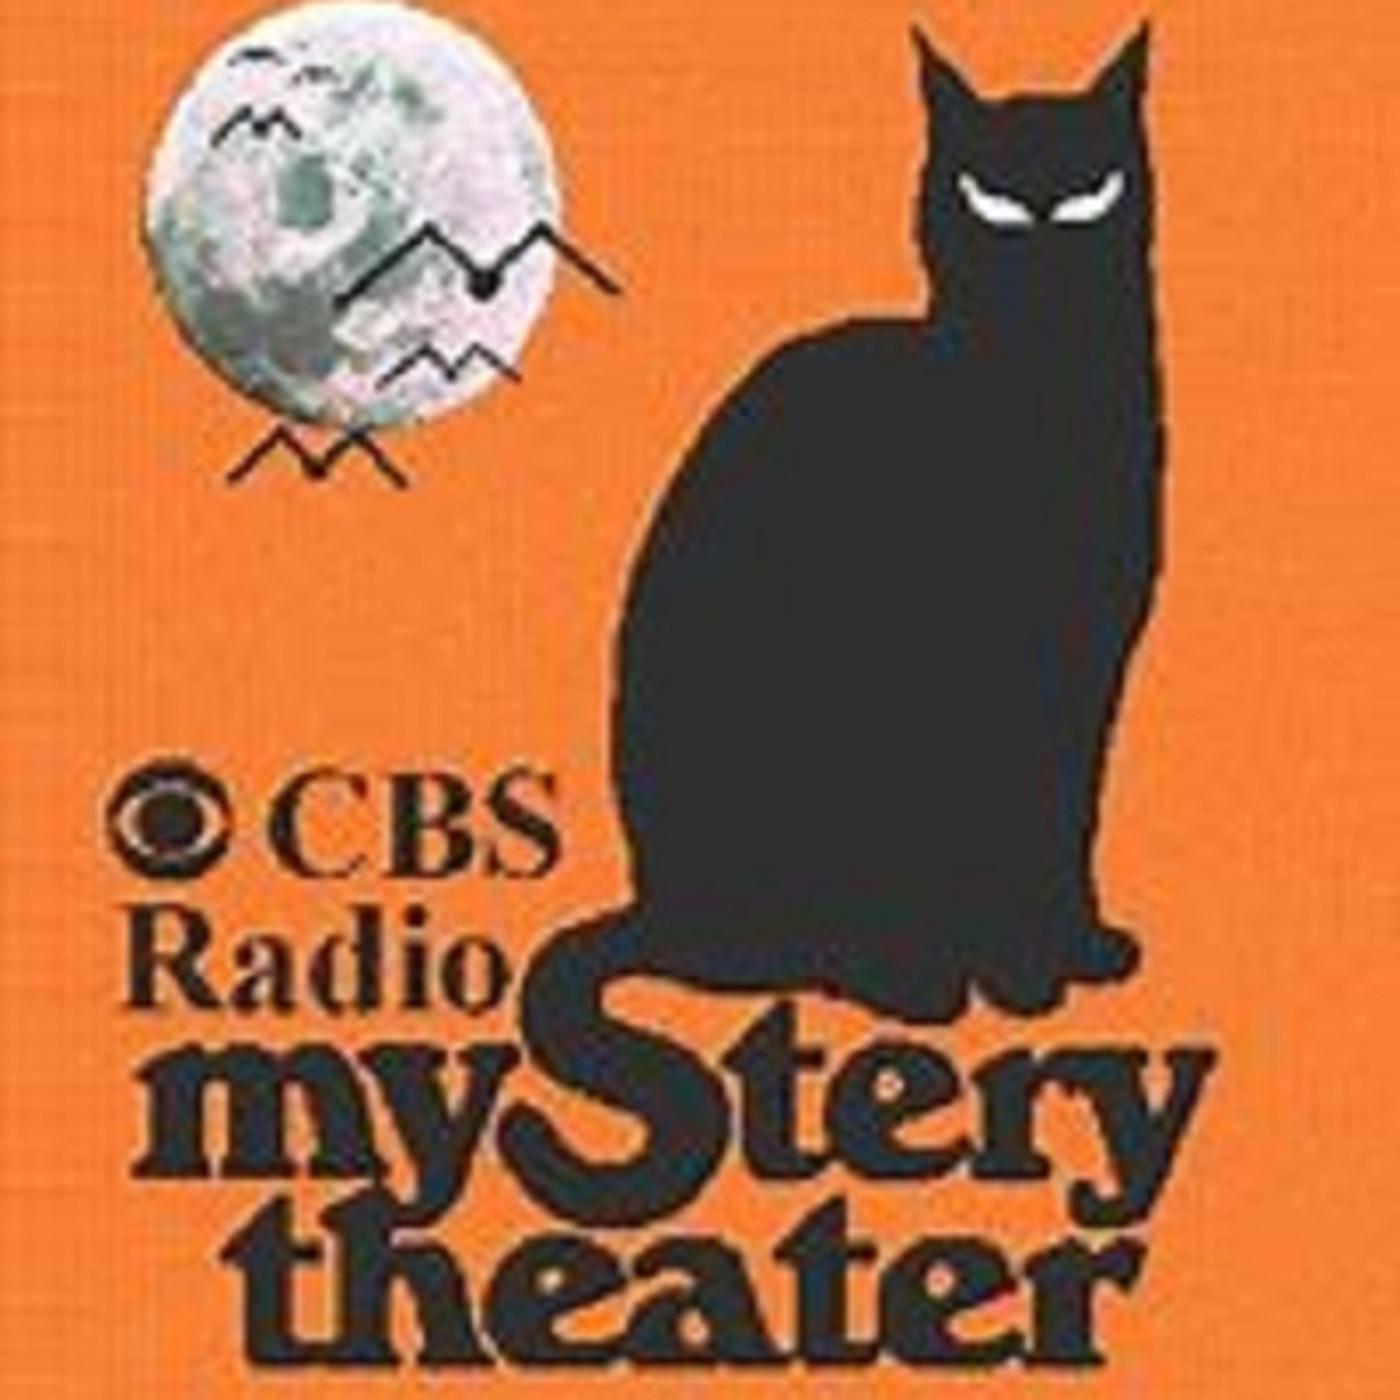 CBS Radio Mystery Theater_79-10-03_(1018)_The Finger Of God